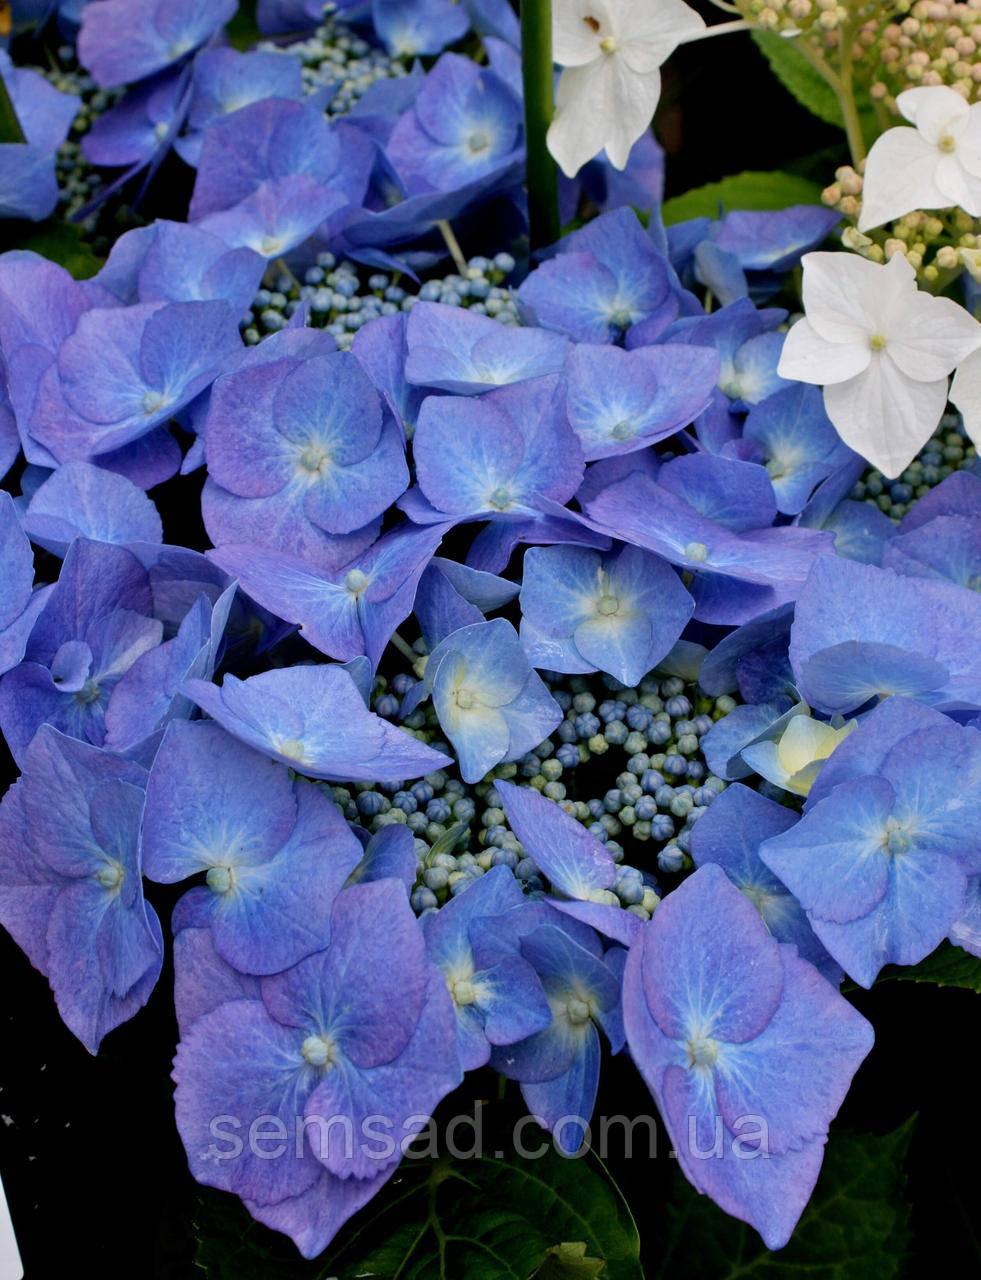 Гортензия крупнолистная Блюберд \ Hydrangea macrophylla Bluebird  ( саженцы )